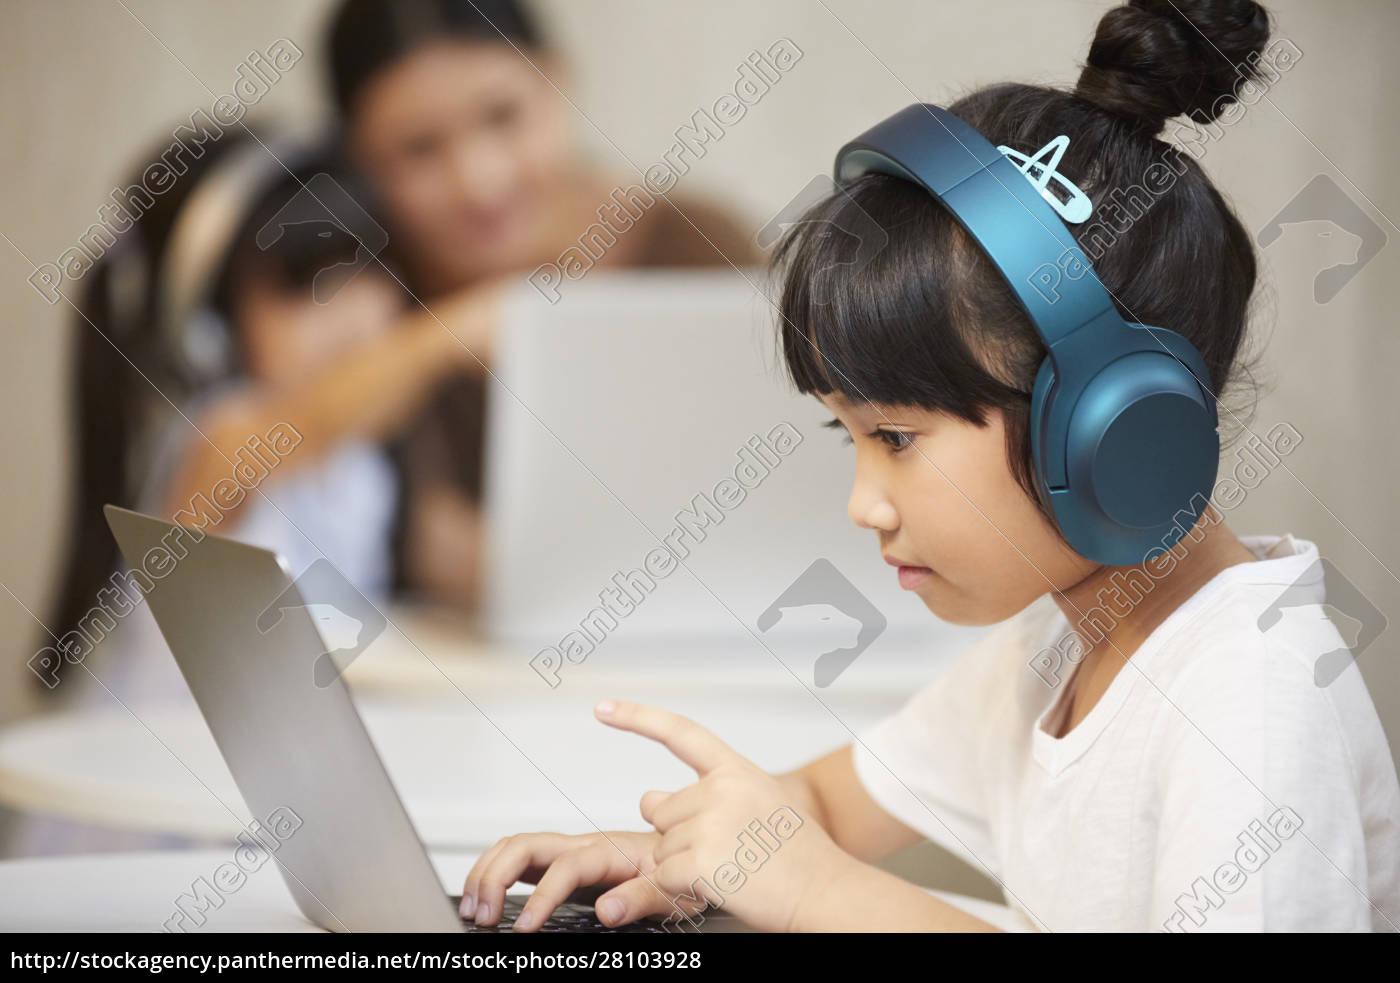 schoolchild, school, life - 28103928